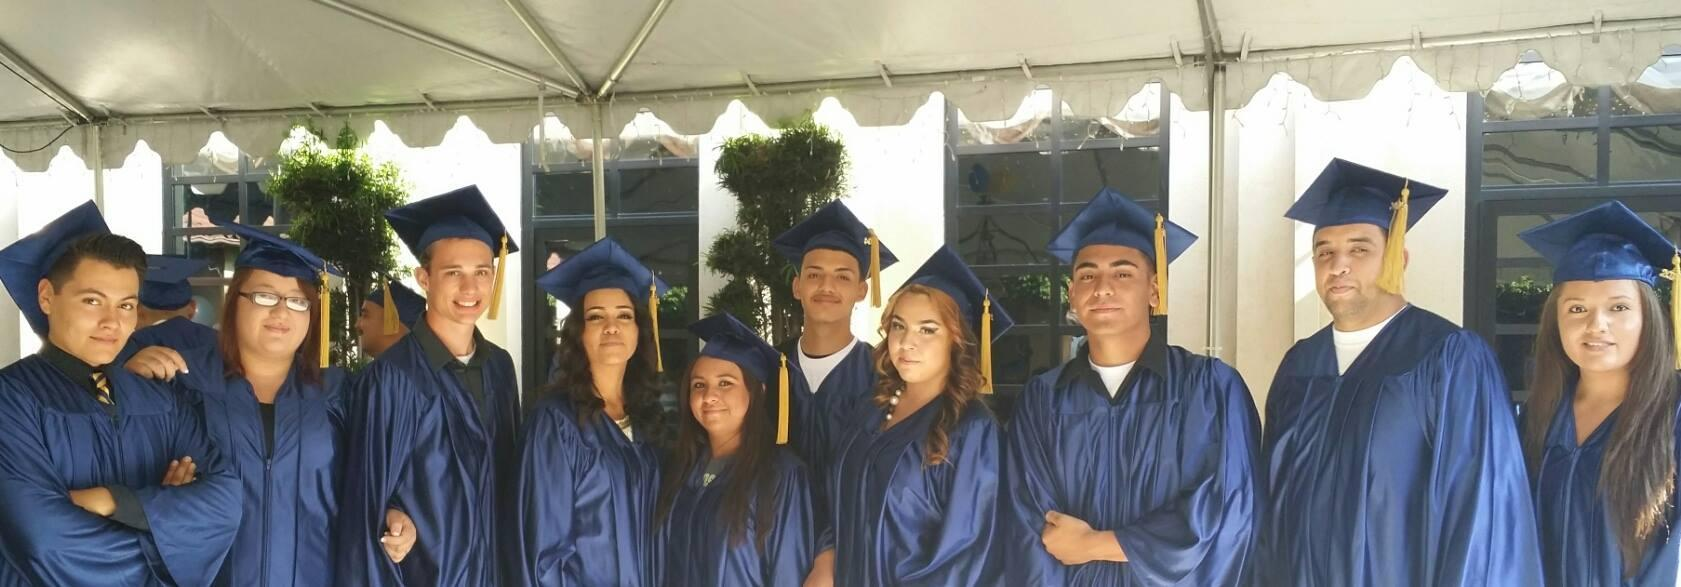 Pomona 2014 graduates